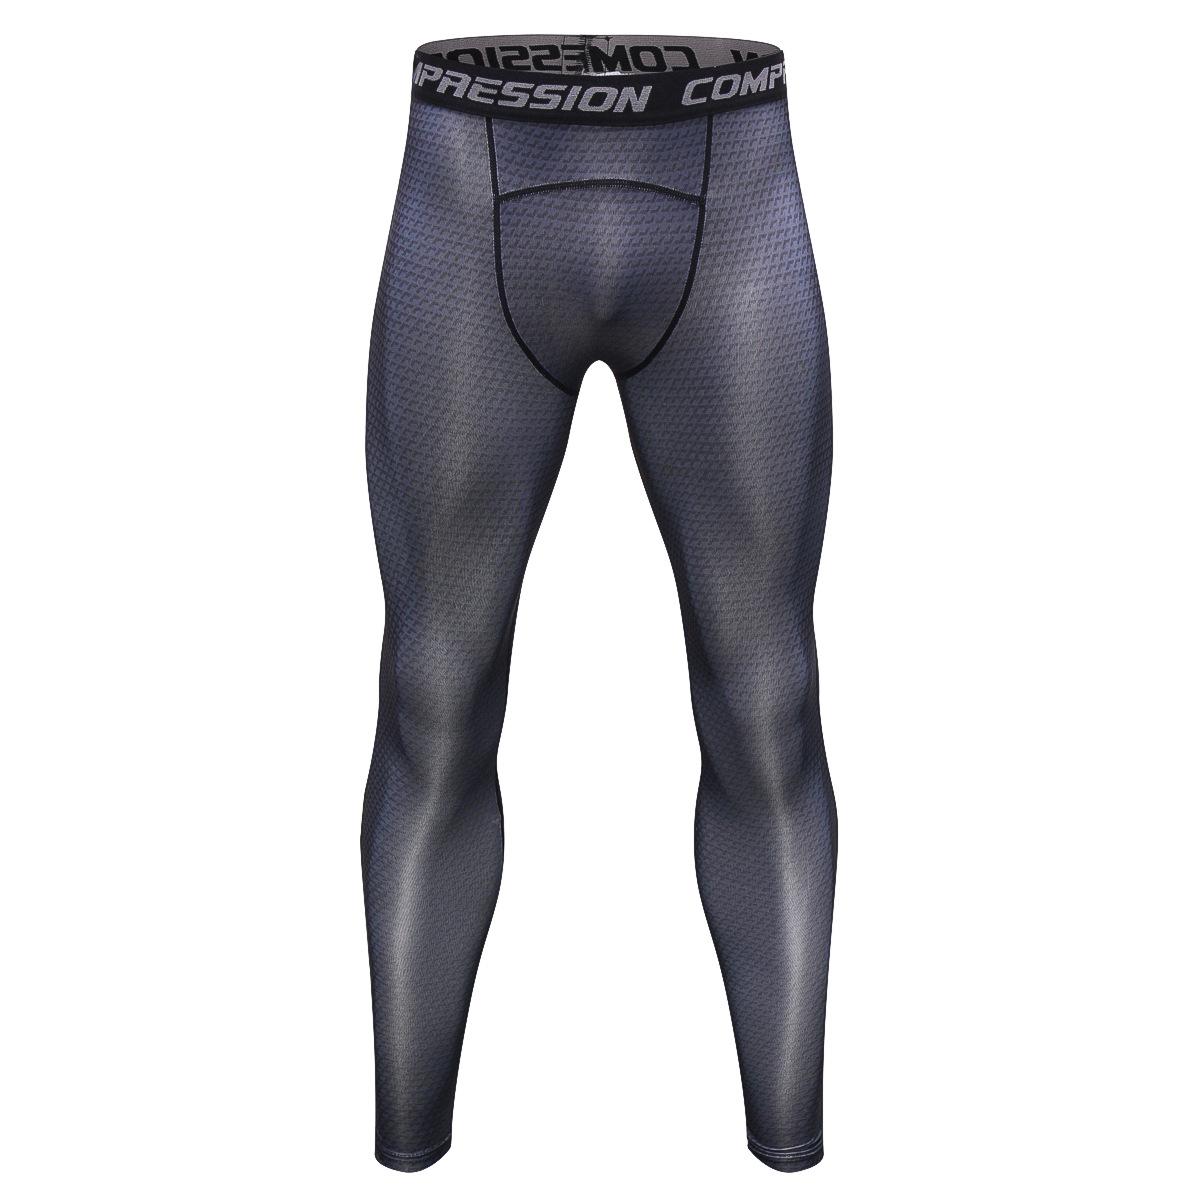 46a9267b895 Men s Tight Compression Base Layer Pants Sports Long Leggings ...